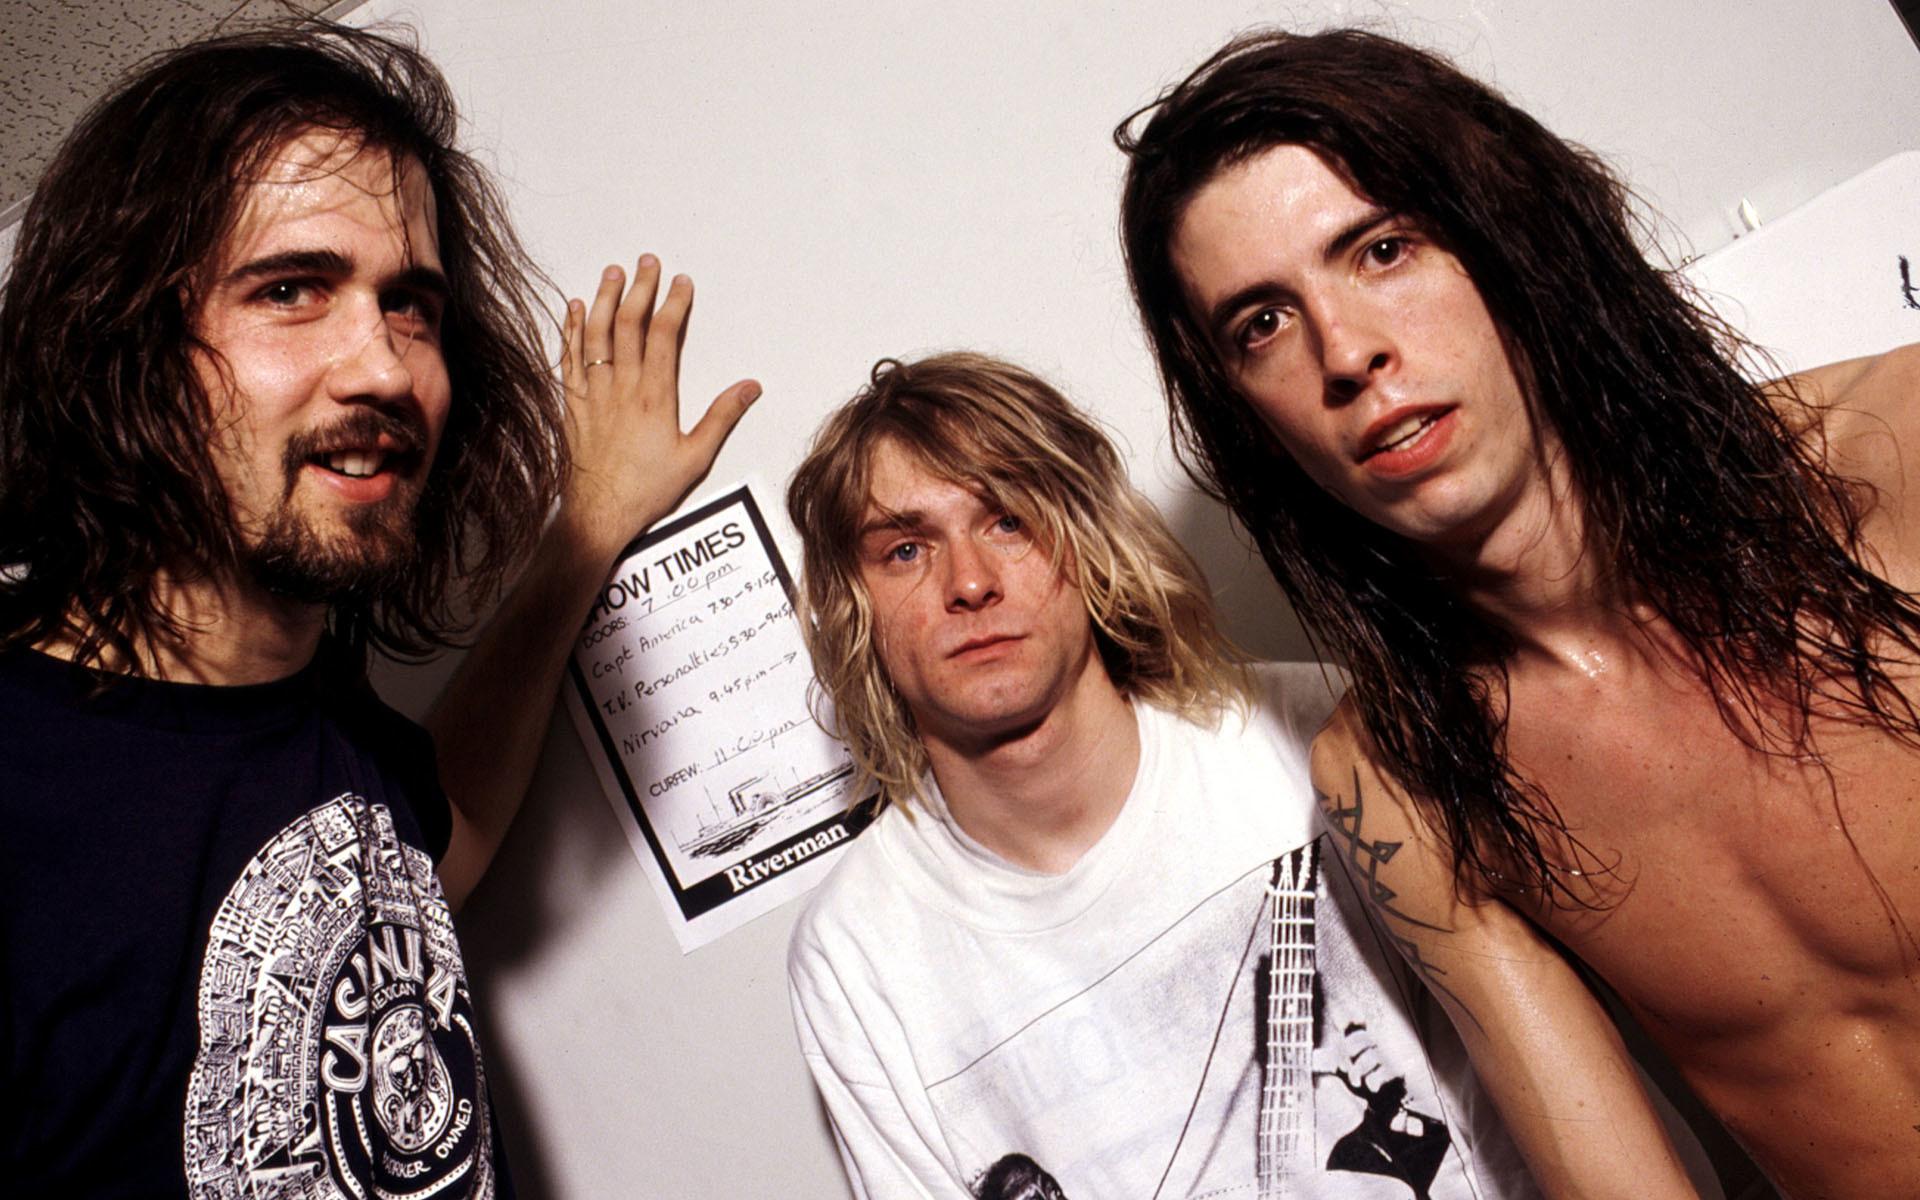 Dave Grohl Nirvana Kurt Cobain | Kurt Cobain Nirvana Dave Grohl wallpaper  background